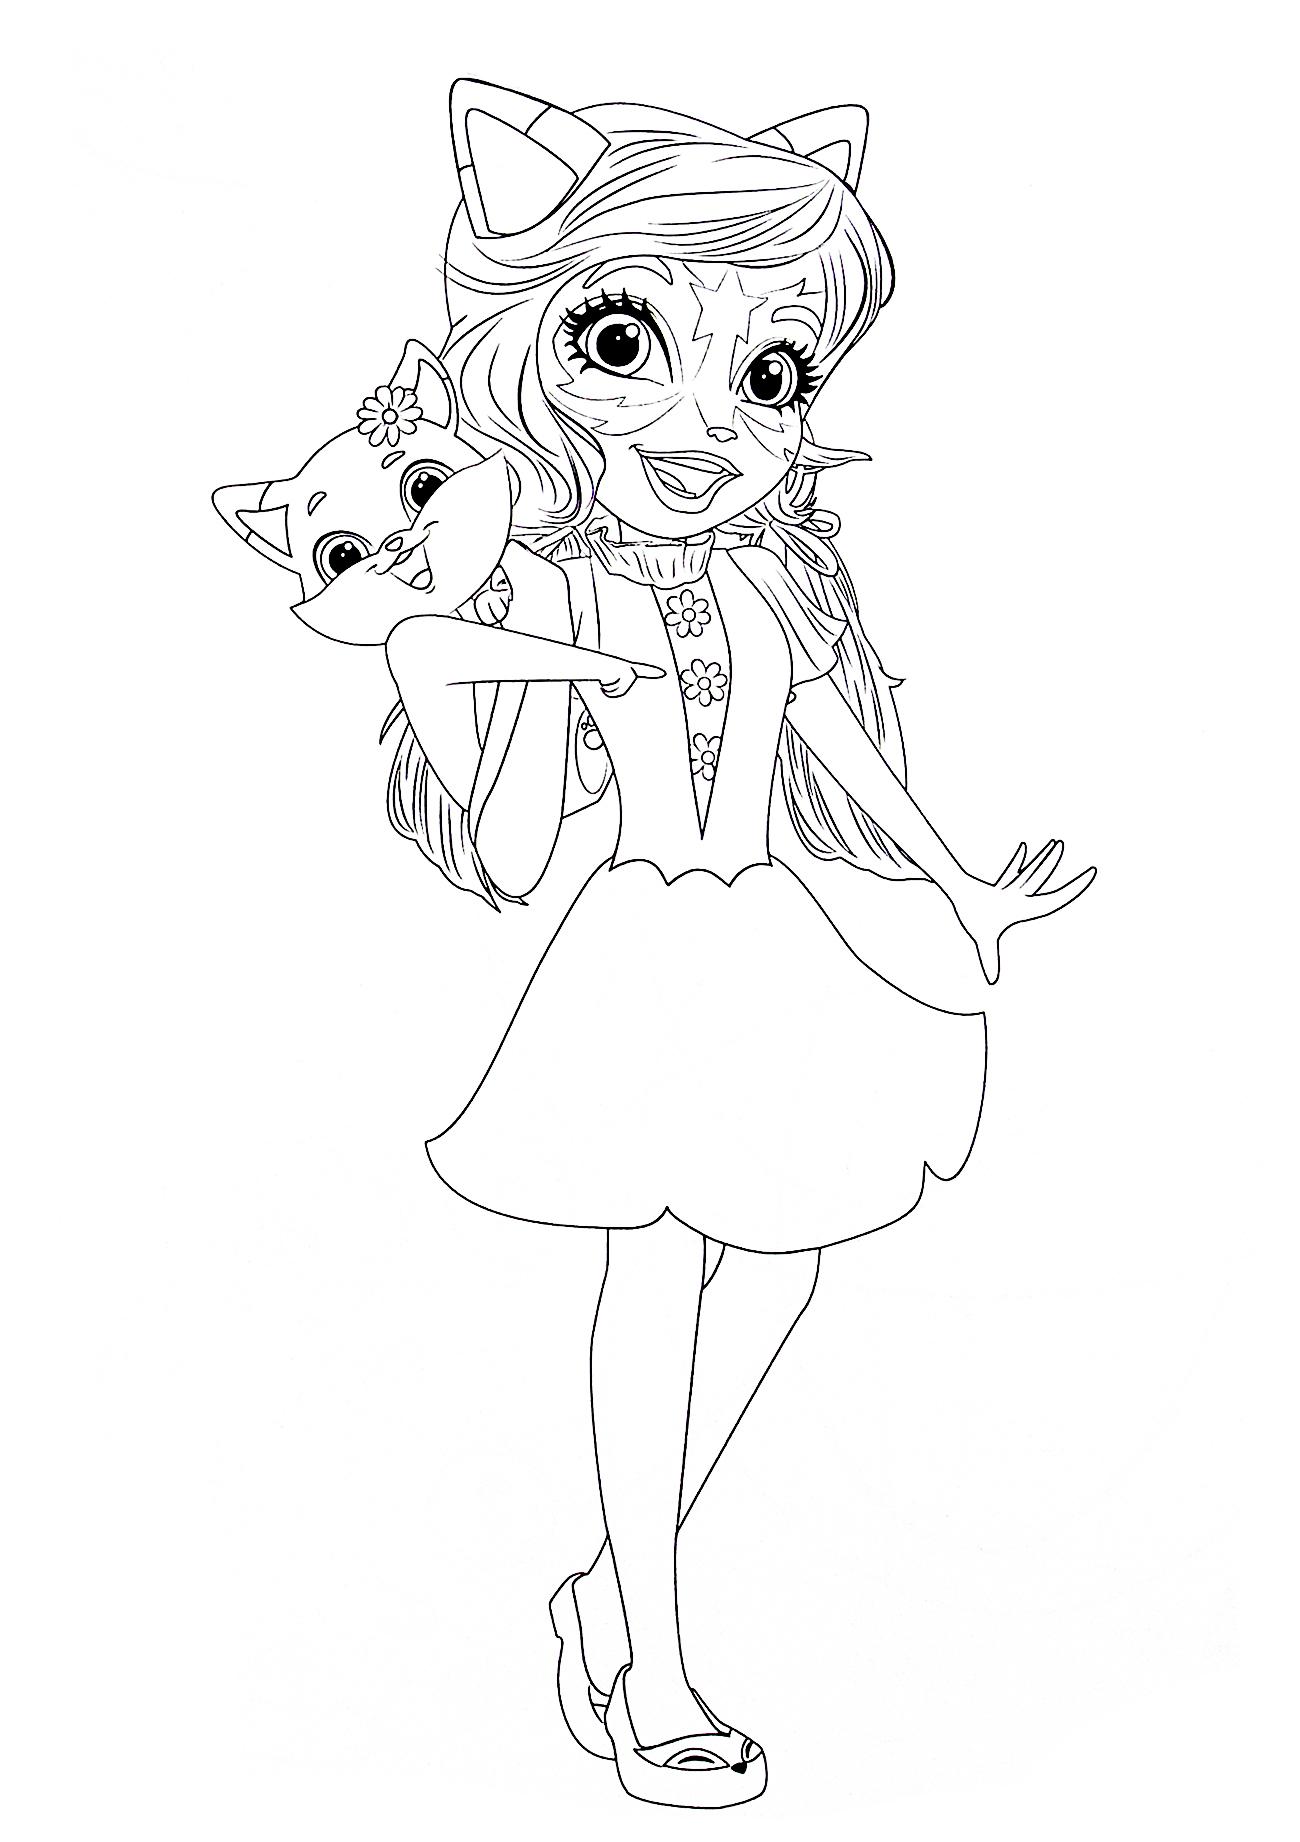 Картинка Раскраска Энчантималс с Фелисити Лис и её ...